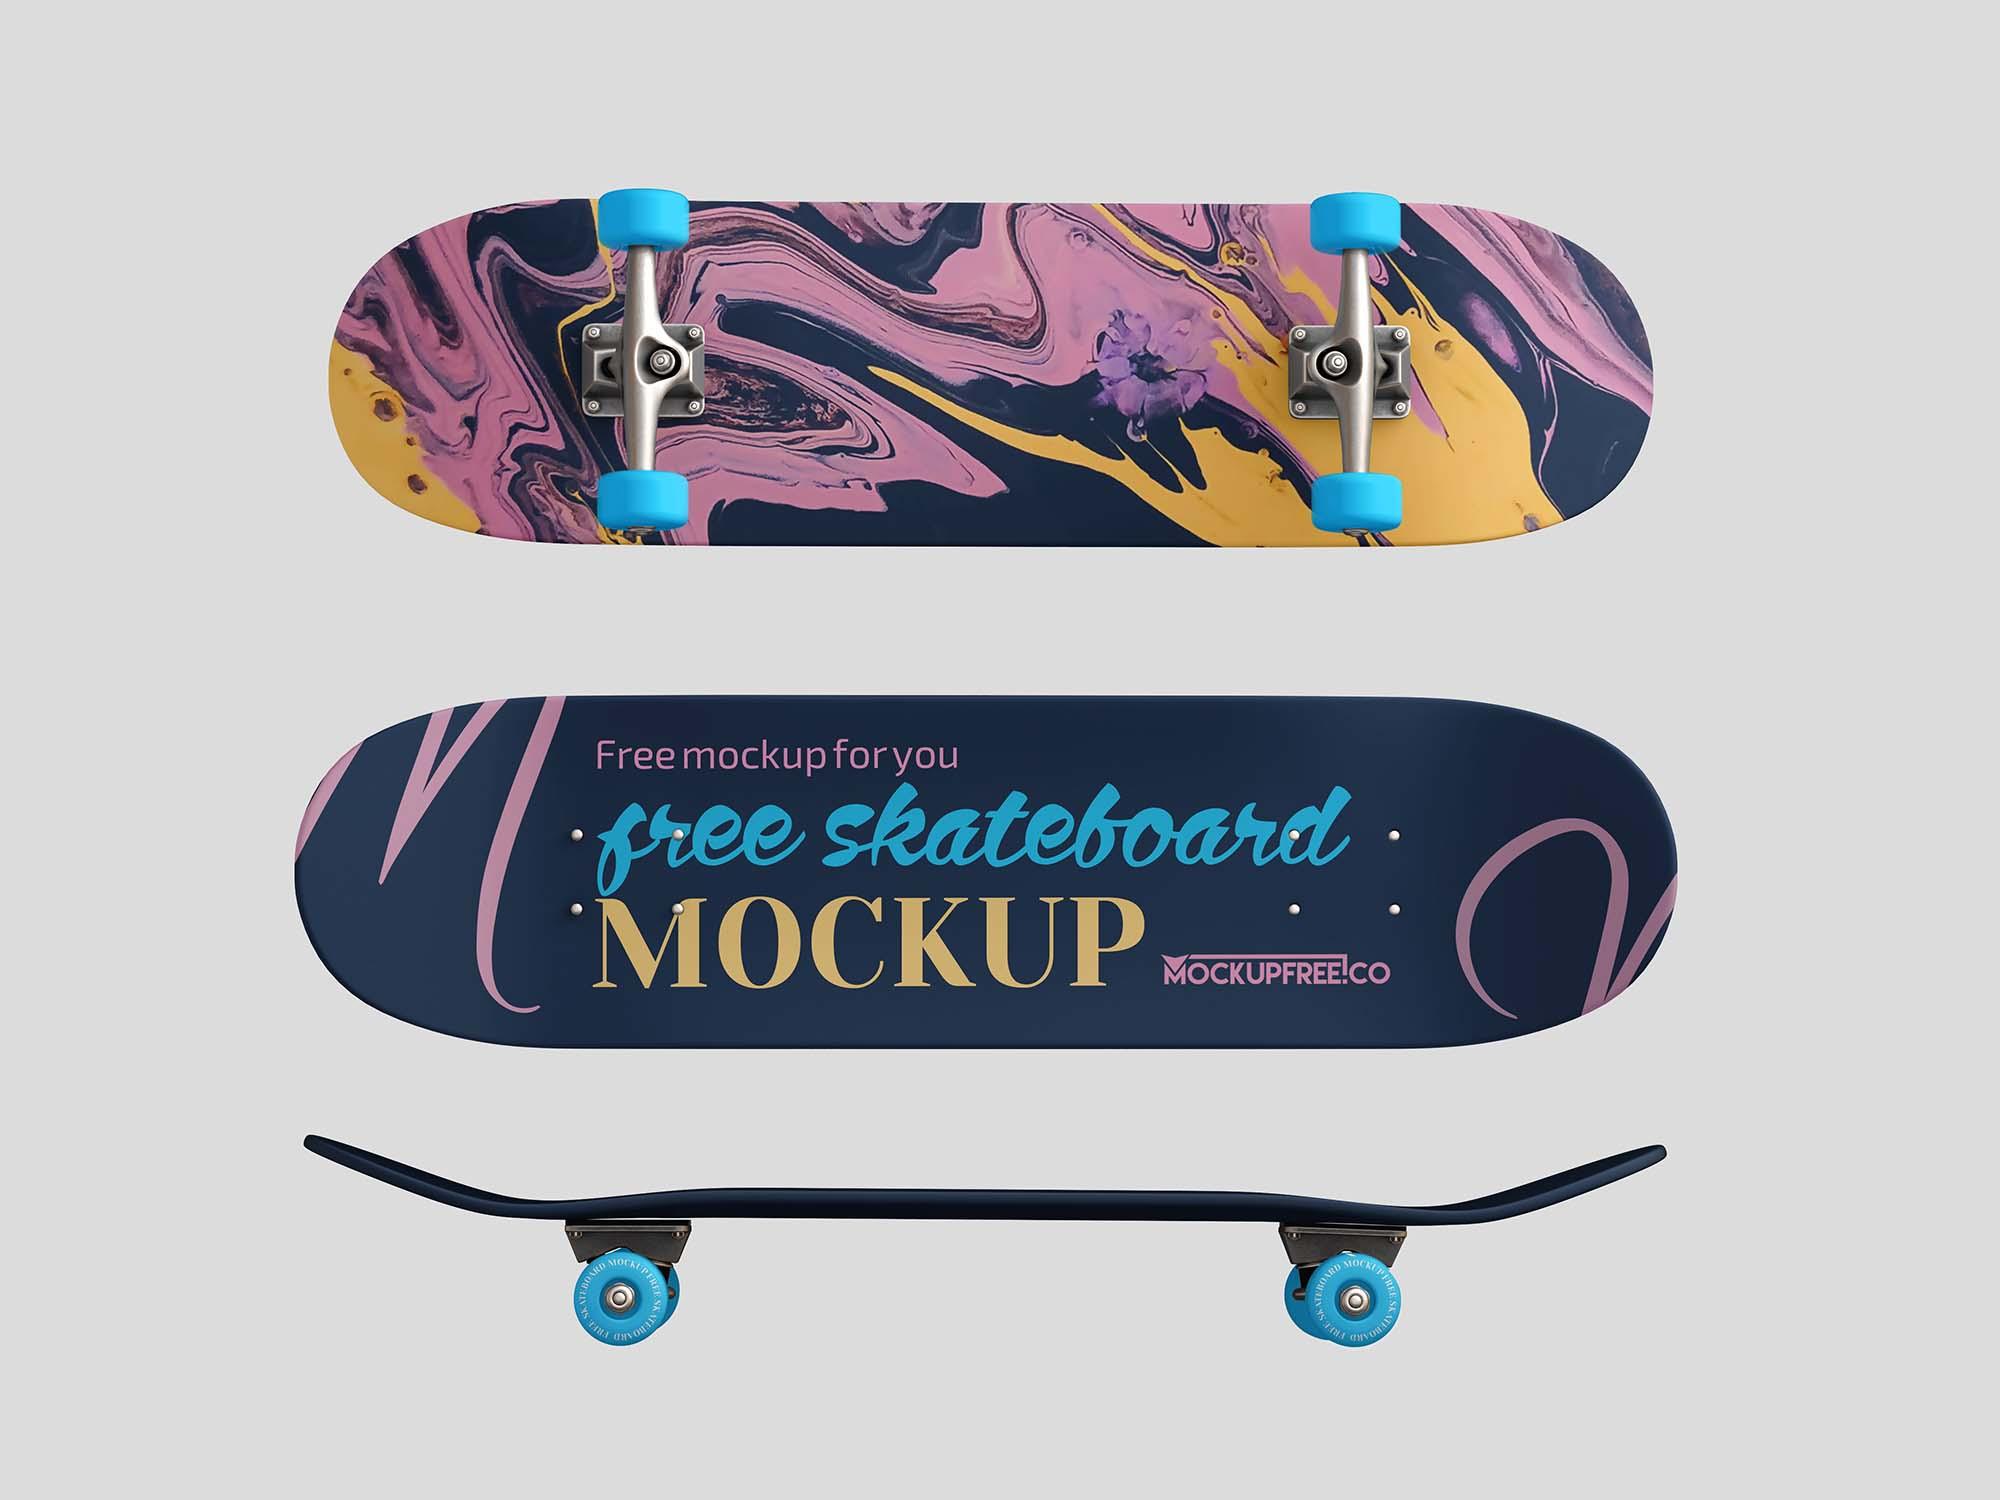 Classic Skateboard Mockup